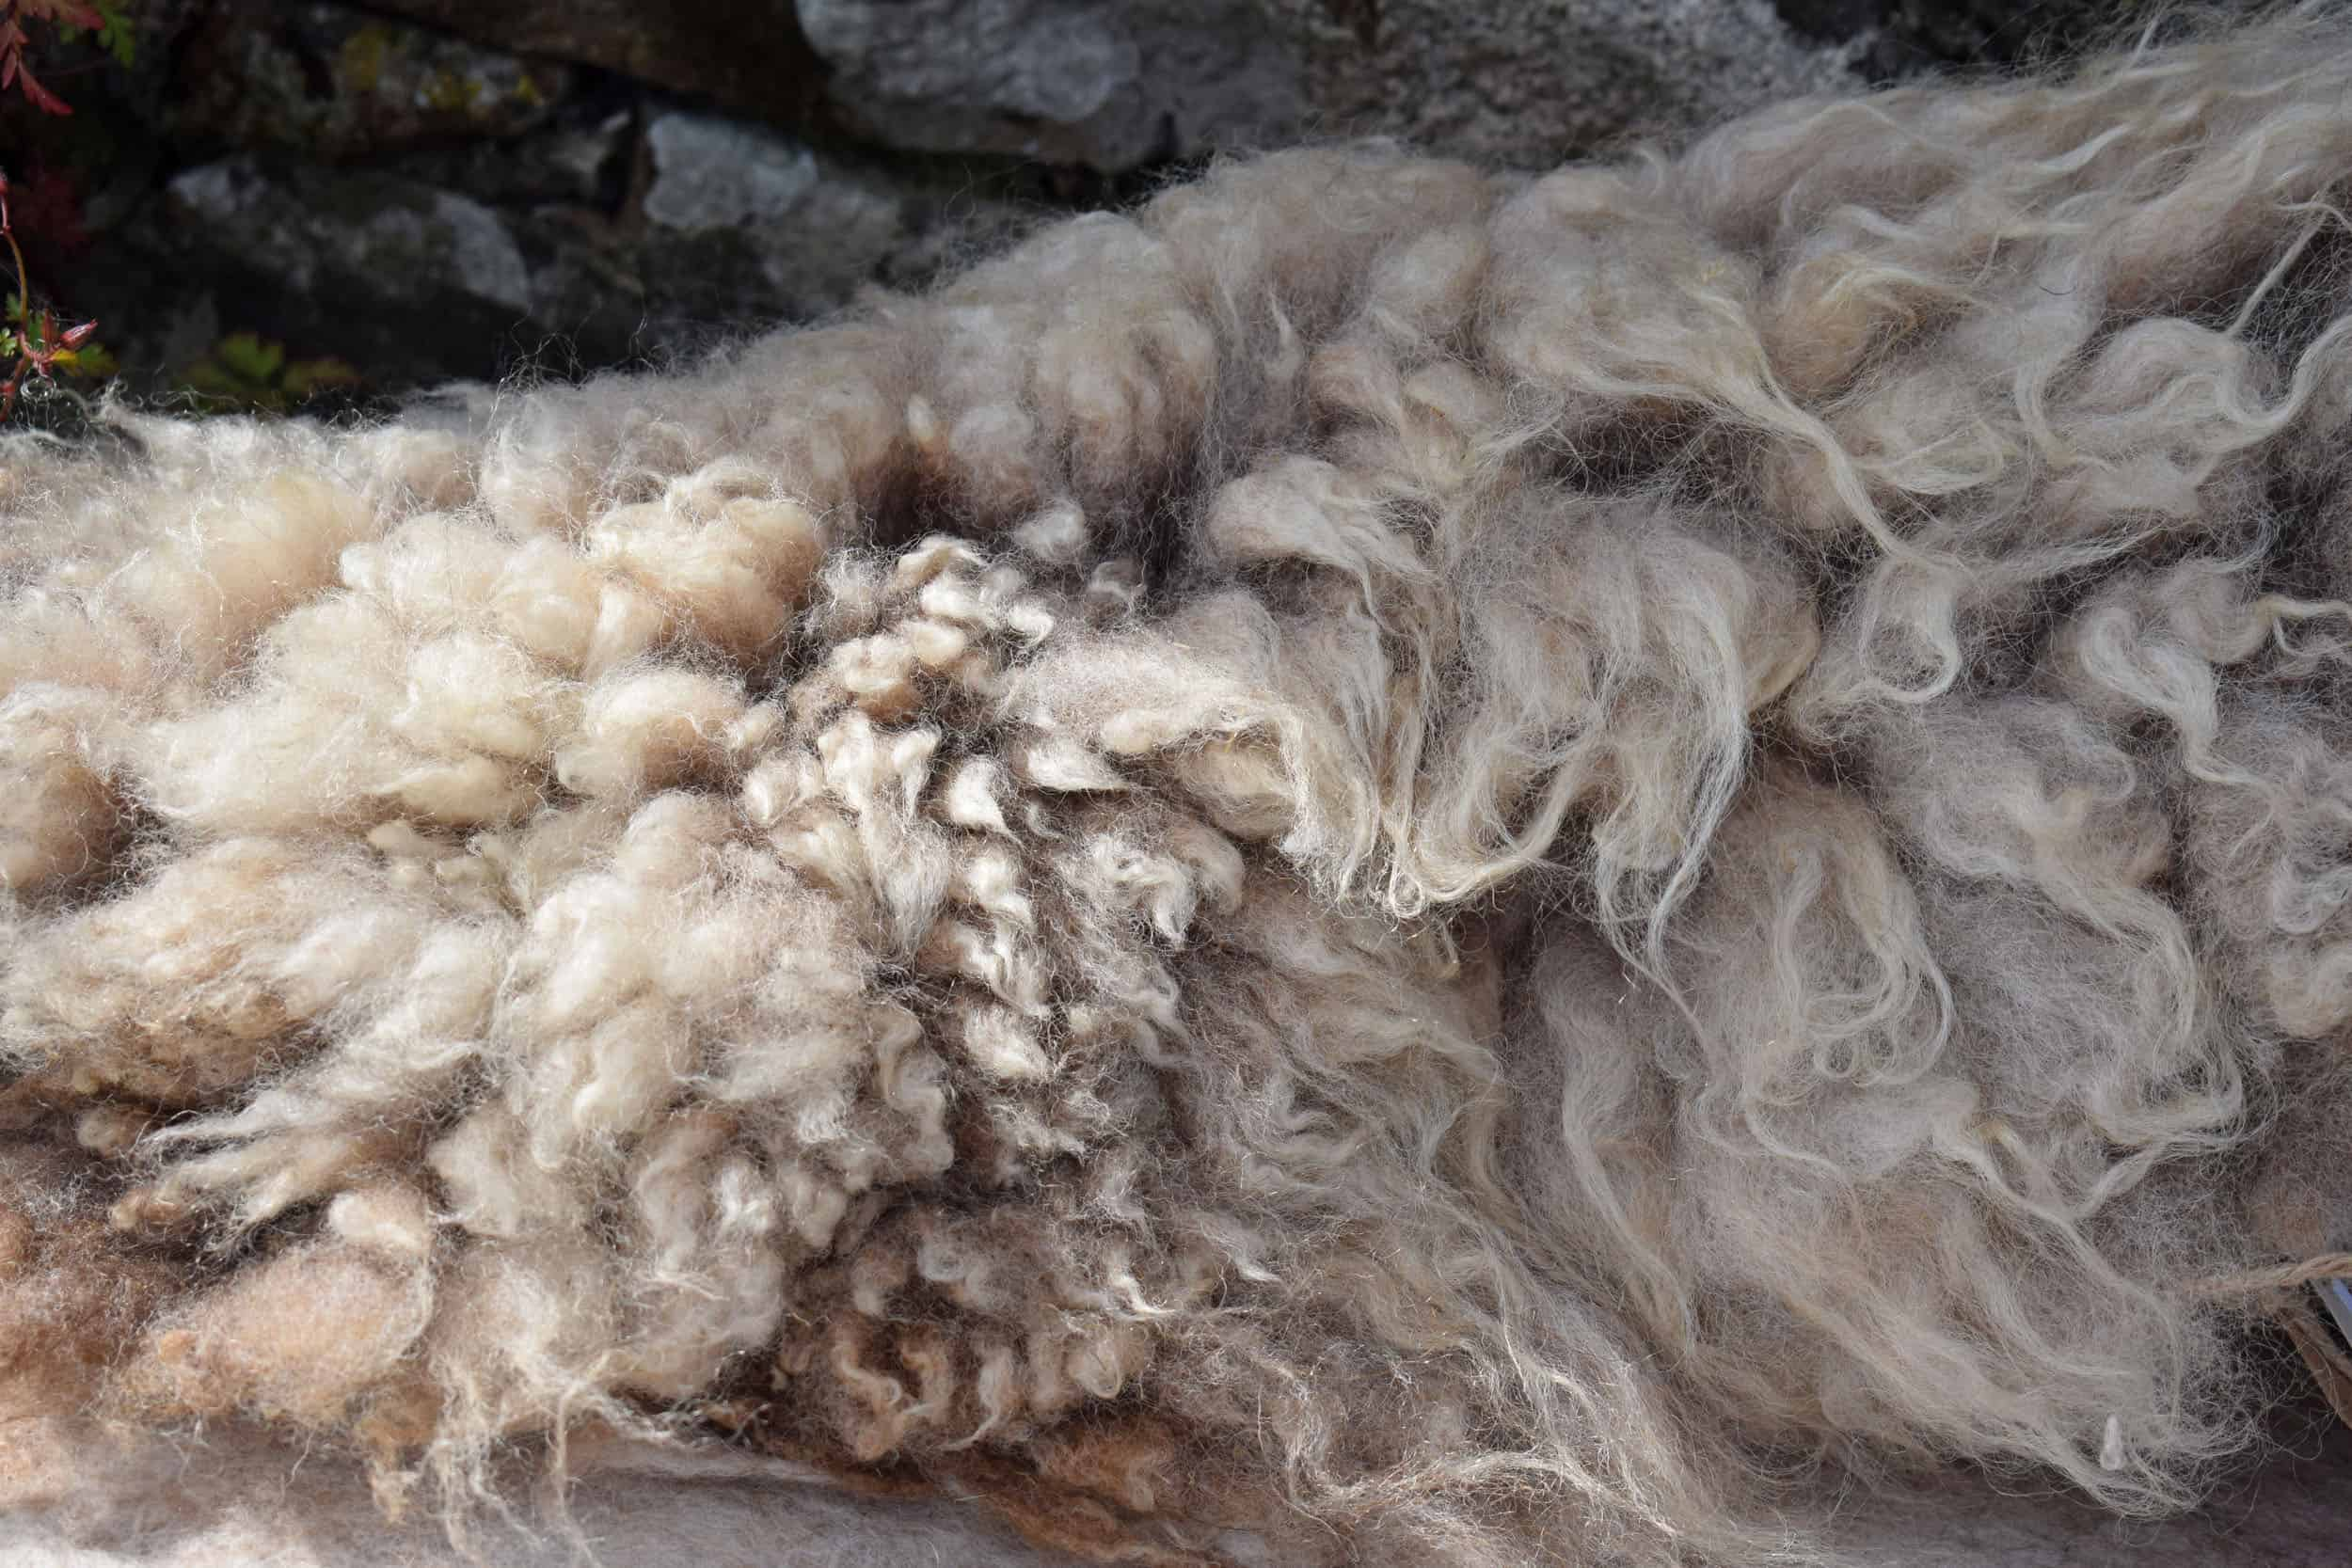 Felted fleece vegetarian sheepskin wool seat pad brown harriet ethical kind fiber